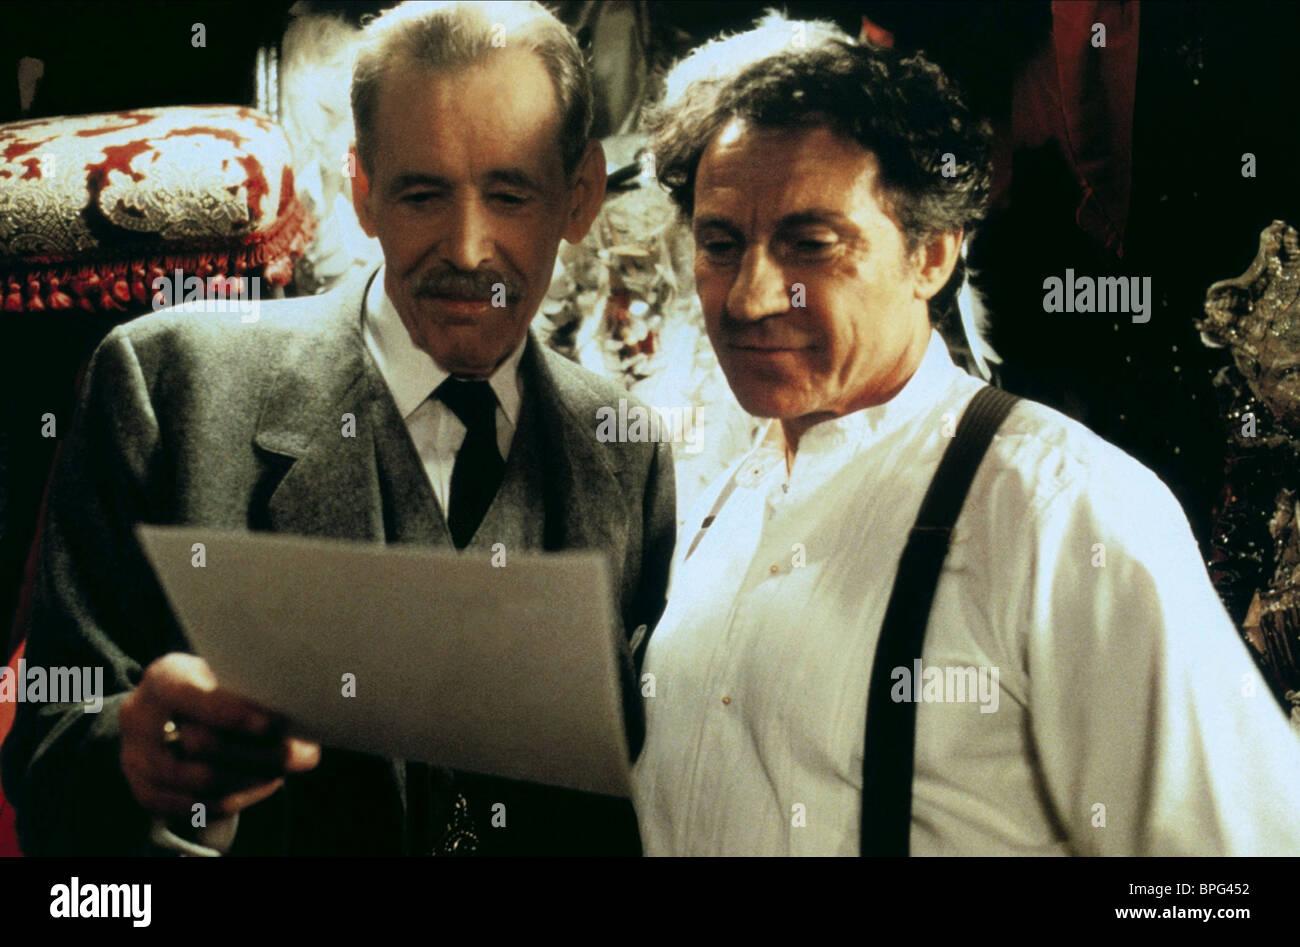 PETER O'TOOLE & HARVEY KEITEL FAIRYTALE: A TRUE STORY; ILLUMINATION (1997) - Stock Image